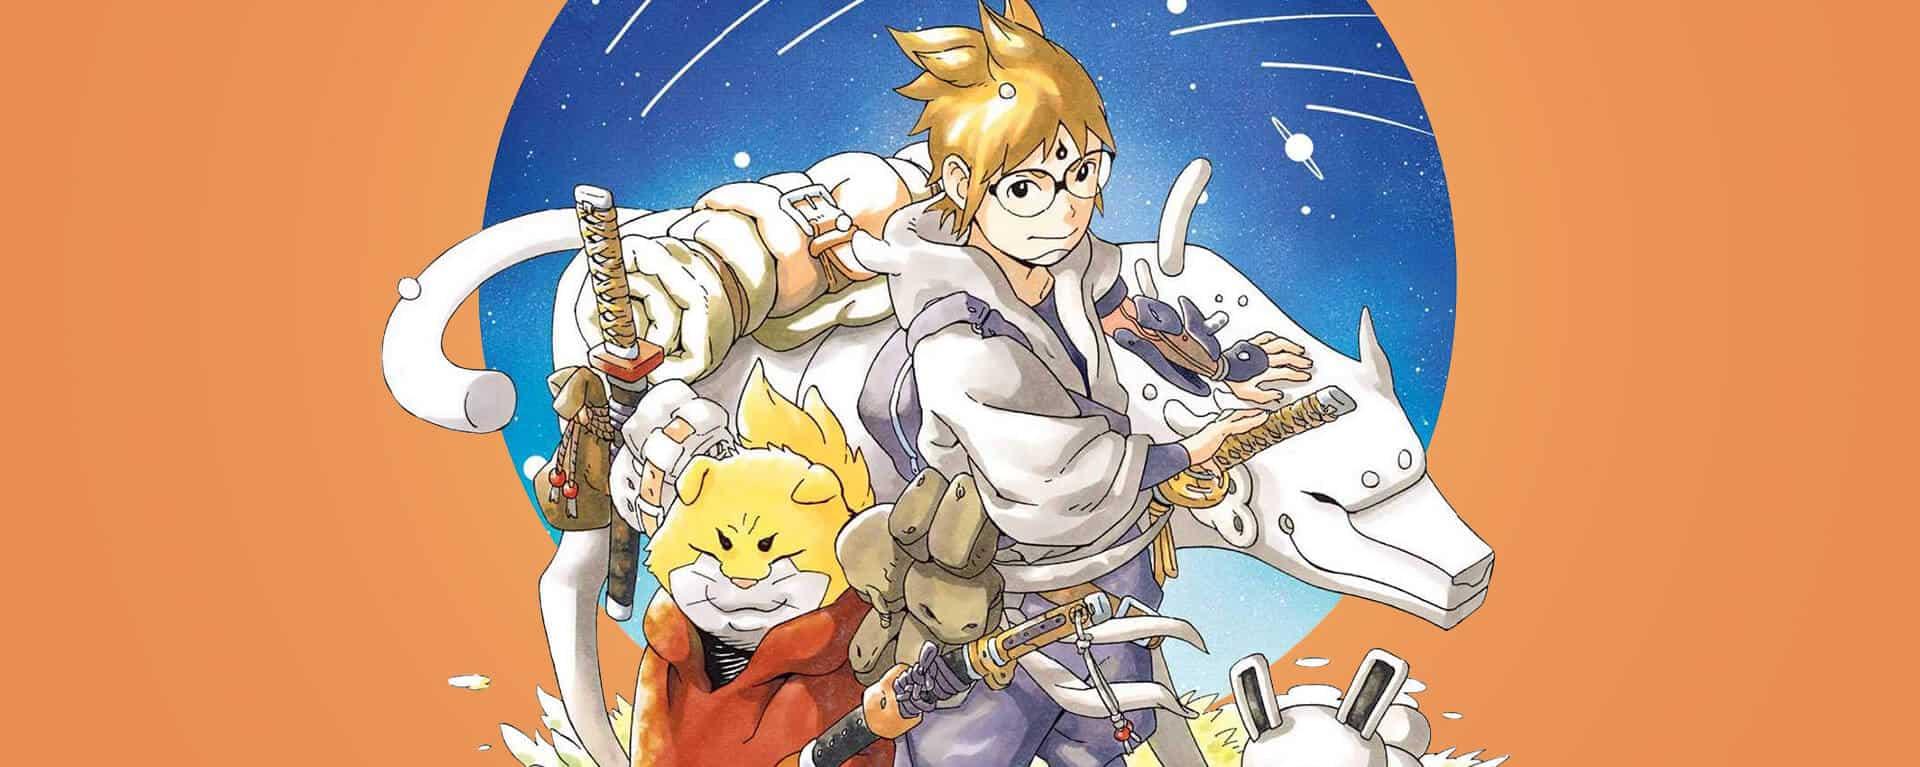 capa de samurai 8 mangá do kishimoto autor de naruto